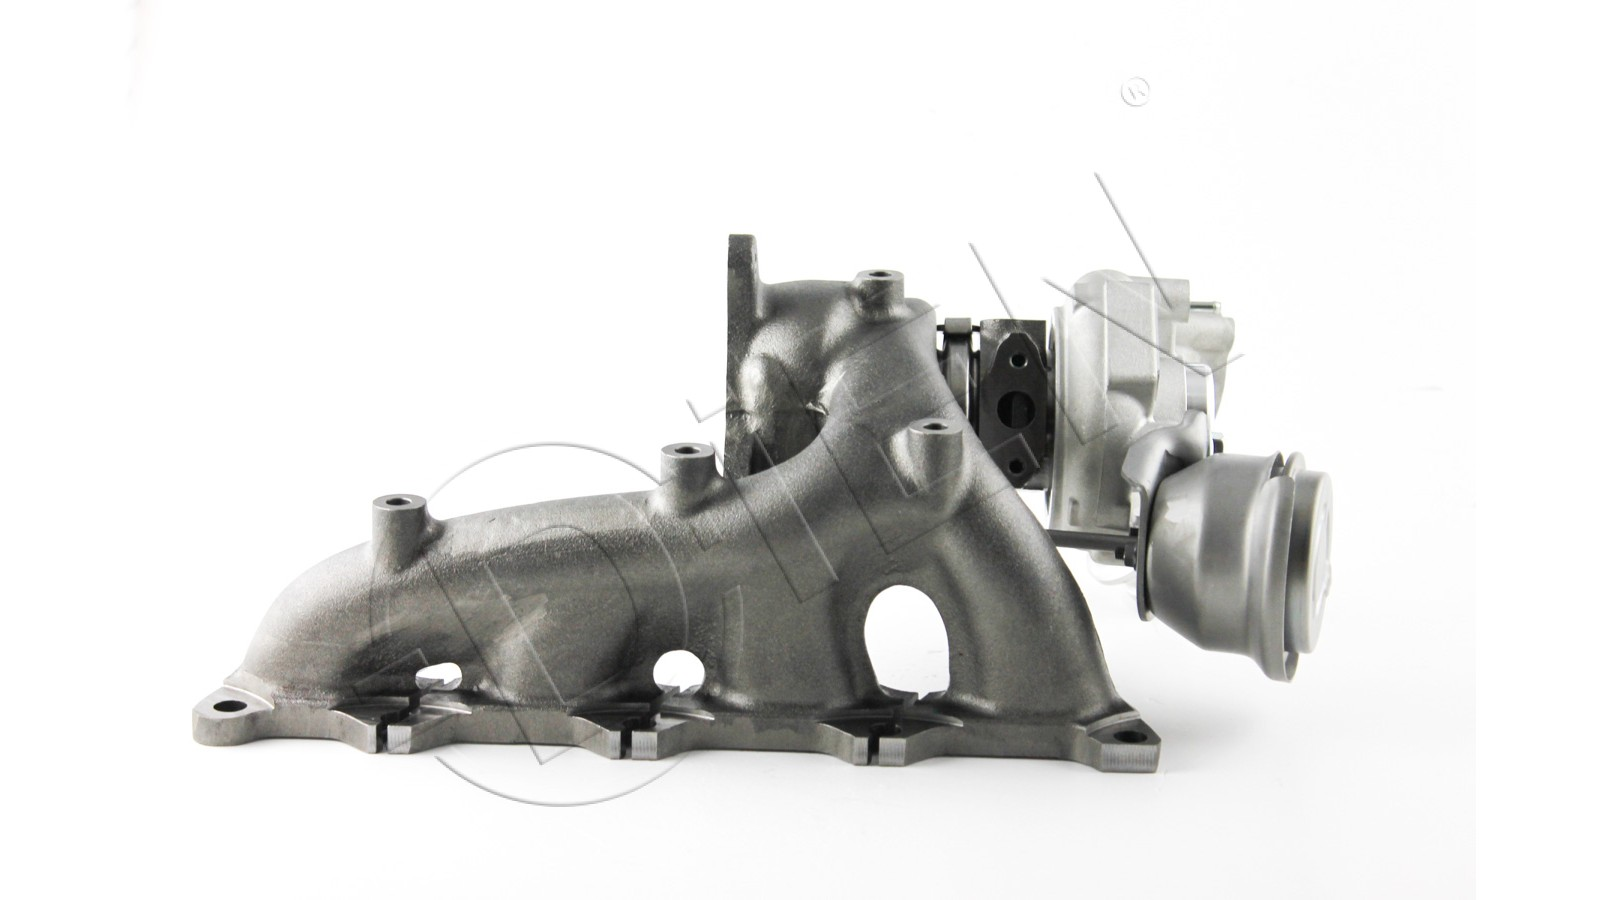 turbina volkswagen passat b6 1 4 tsi 122 cv 49373 01005. Black Bedroom Furniture Sets. Home Design Ideas